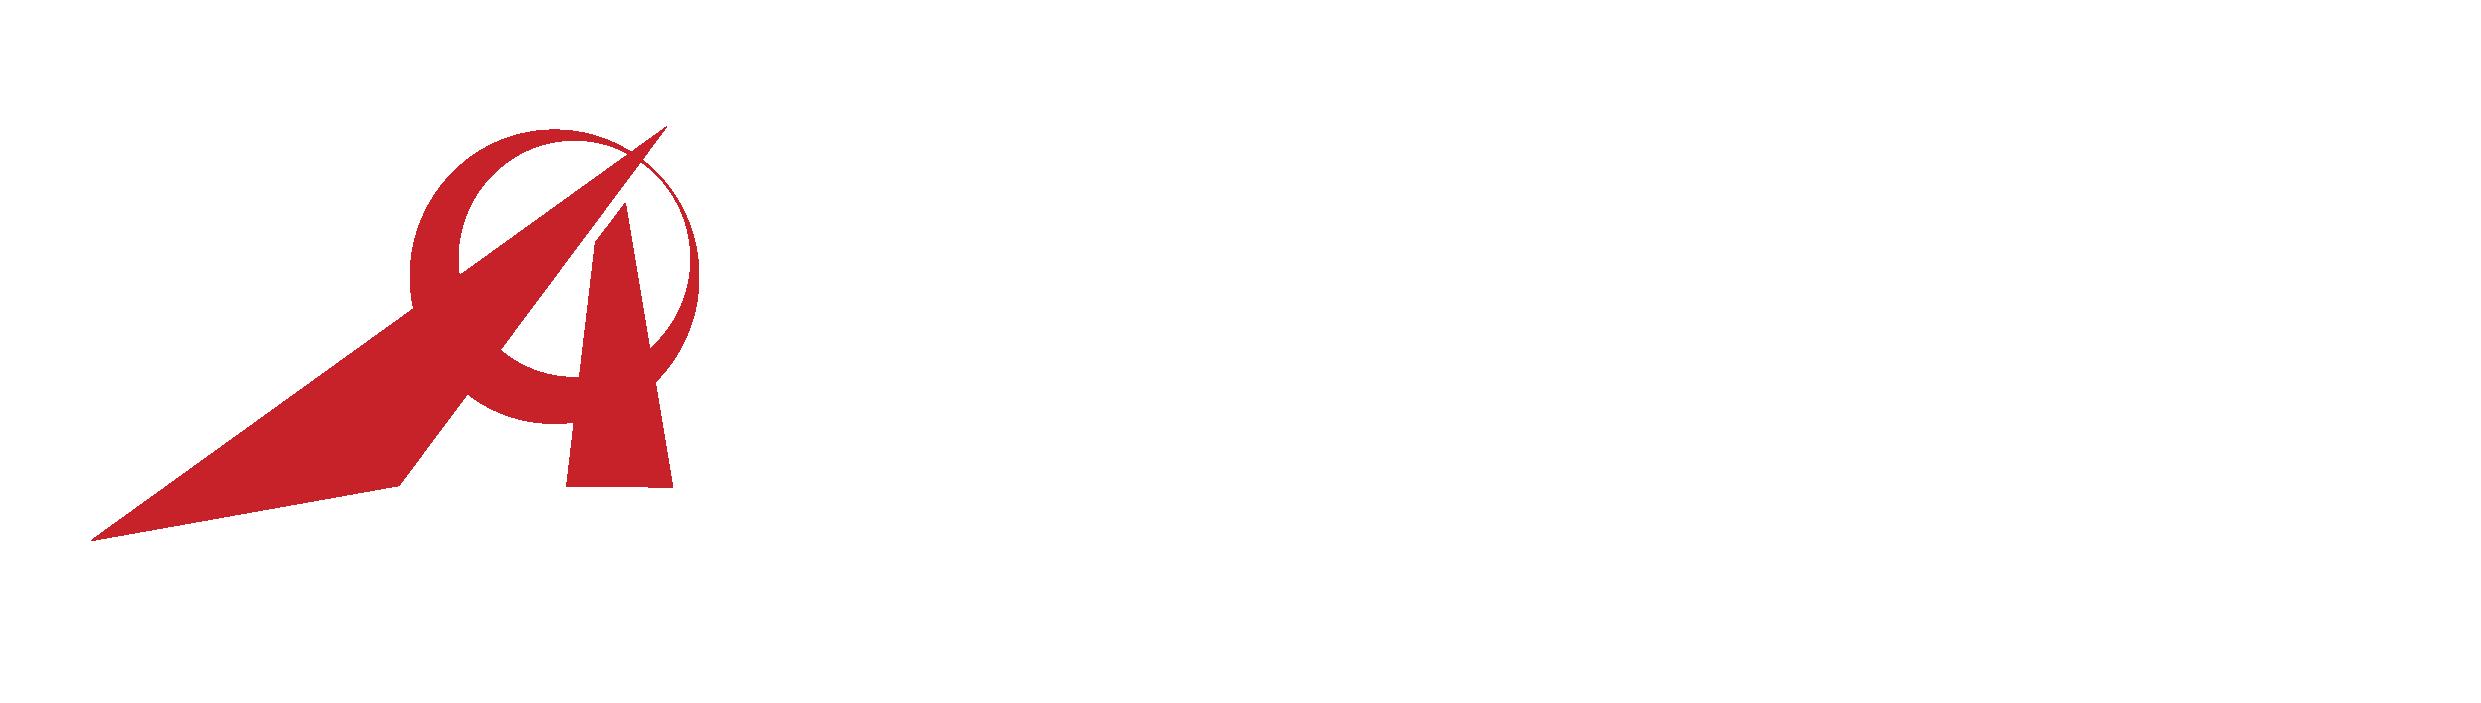 ACEonline, LLC